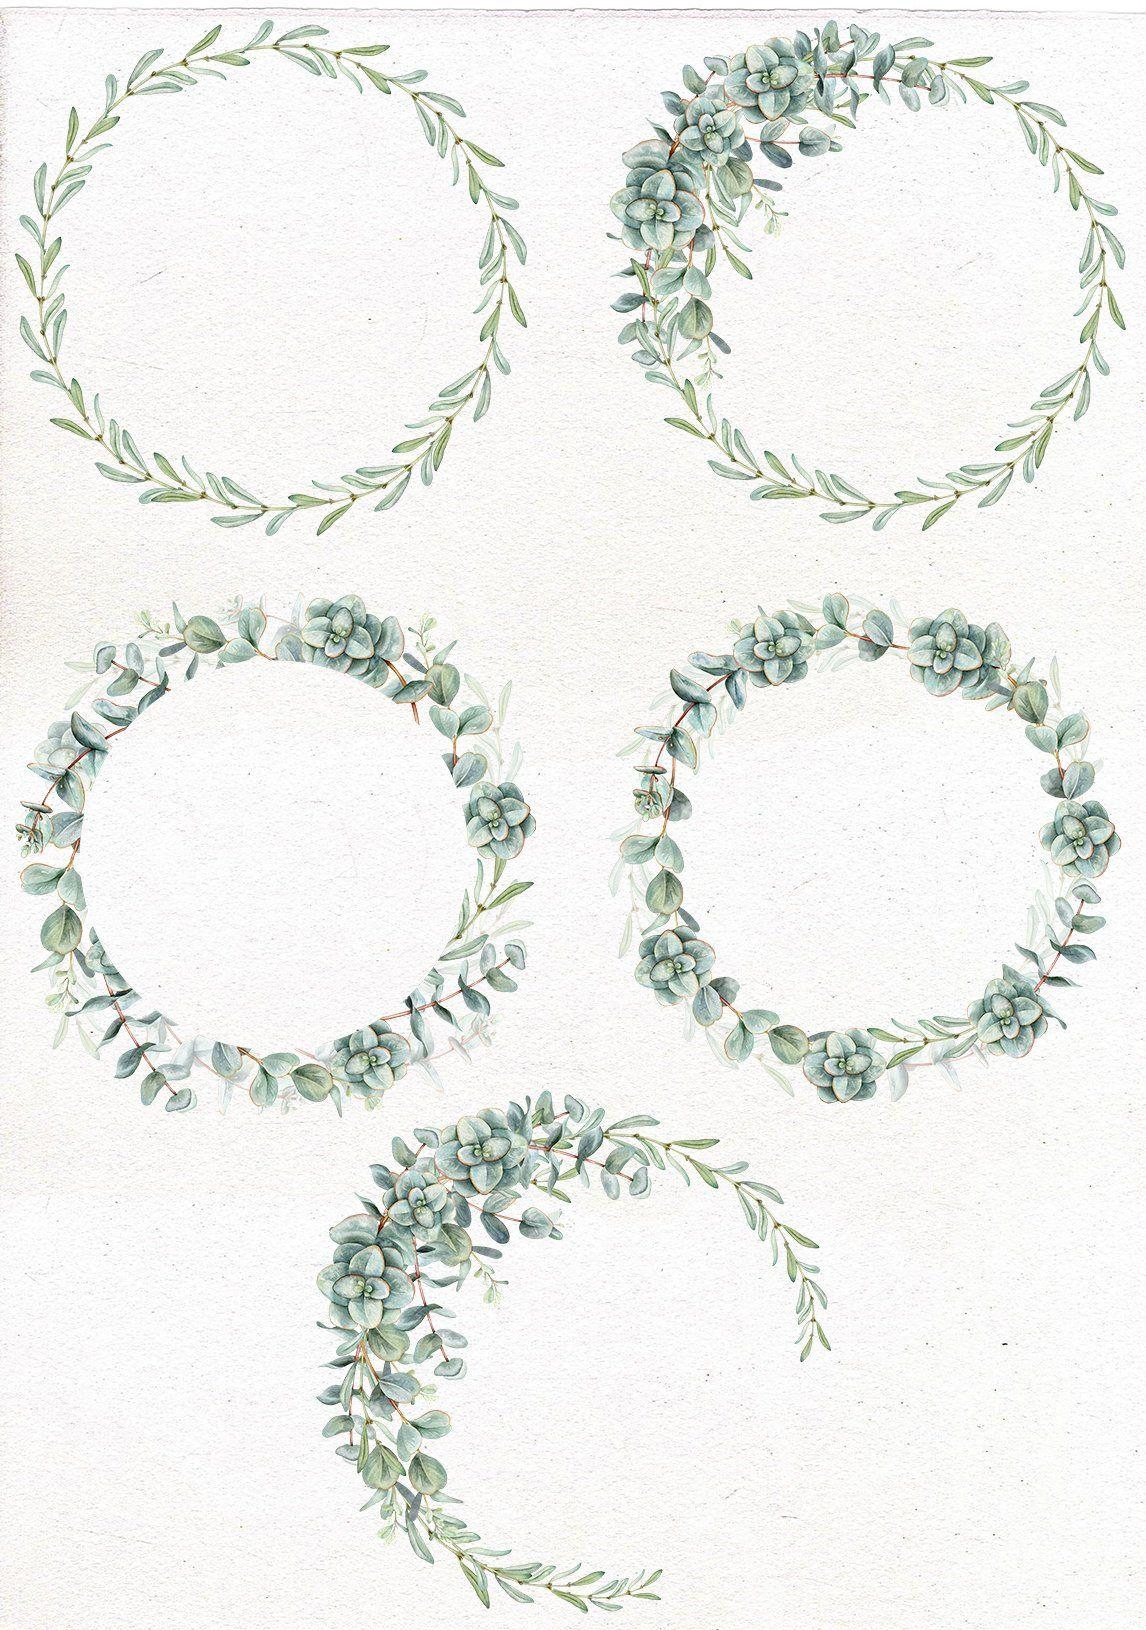 Photo of Watercolor eucalyptus wreath, frame. Greenery clip art, eucalyptus leaves, wedding watercolor greenery, DIY clipart.